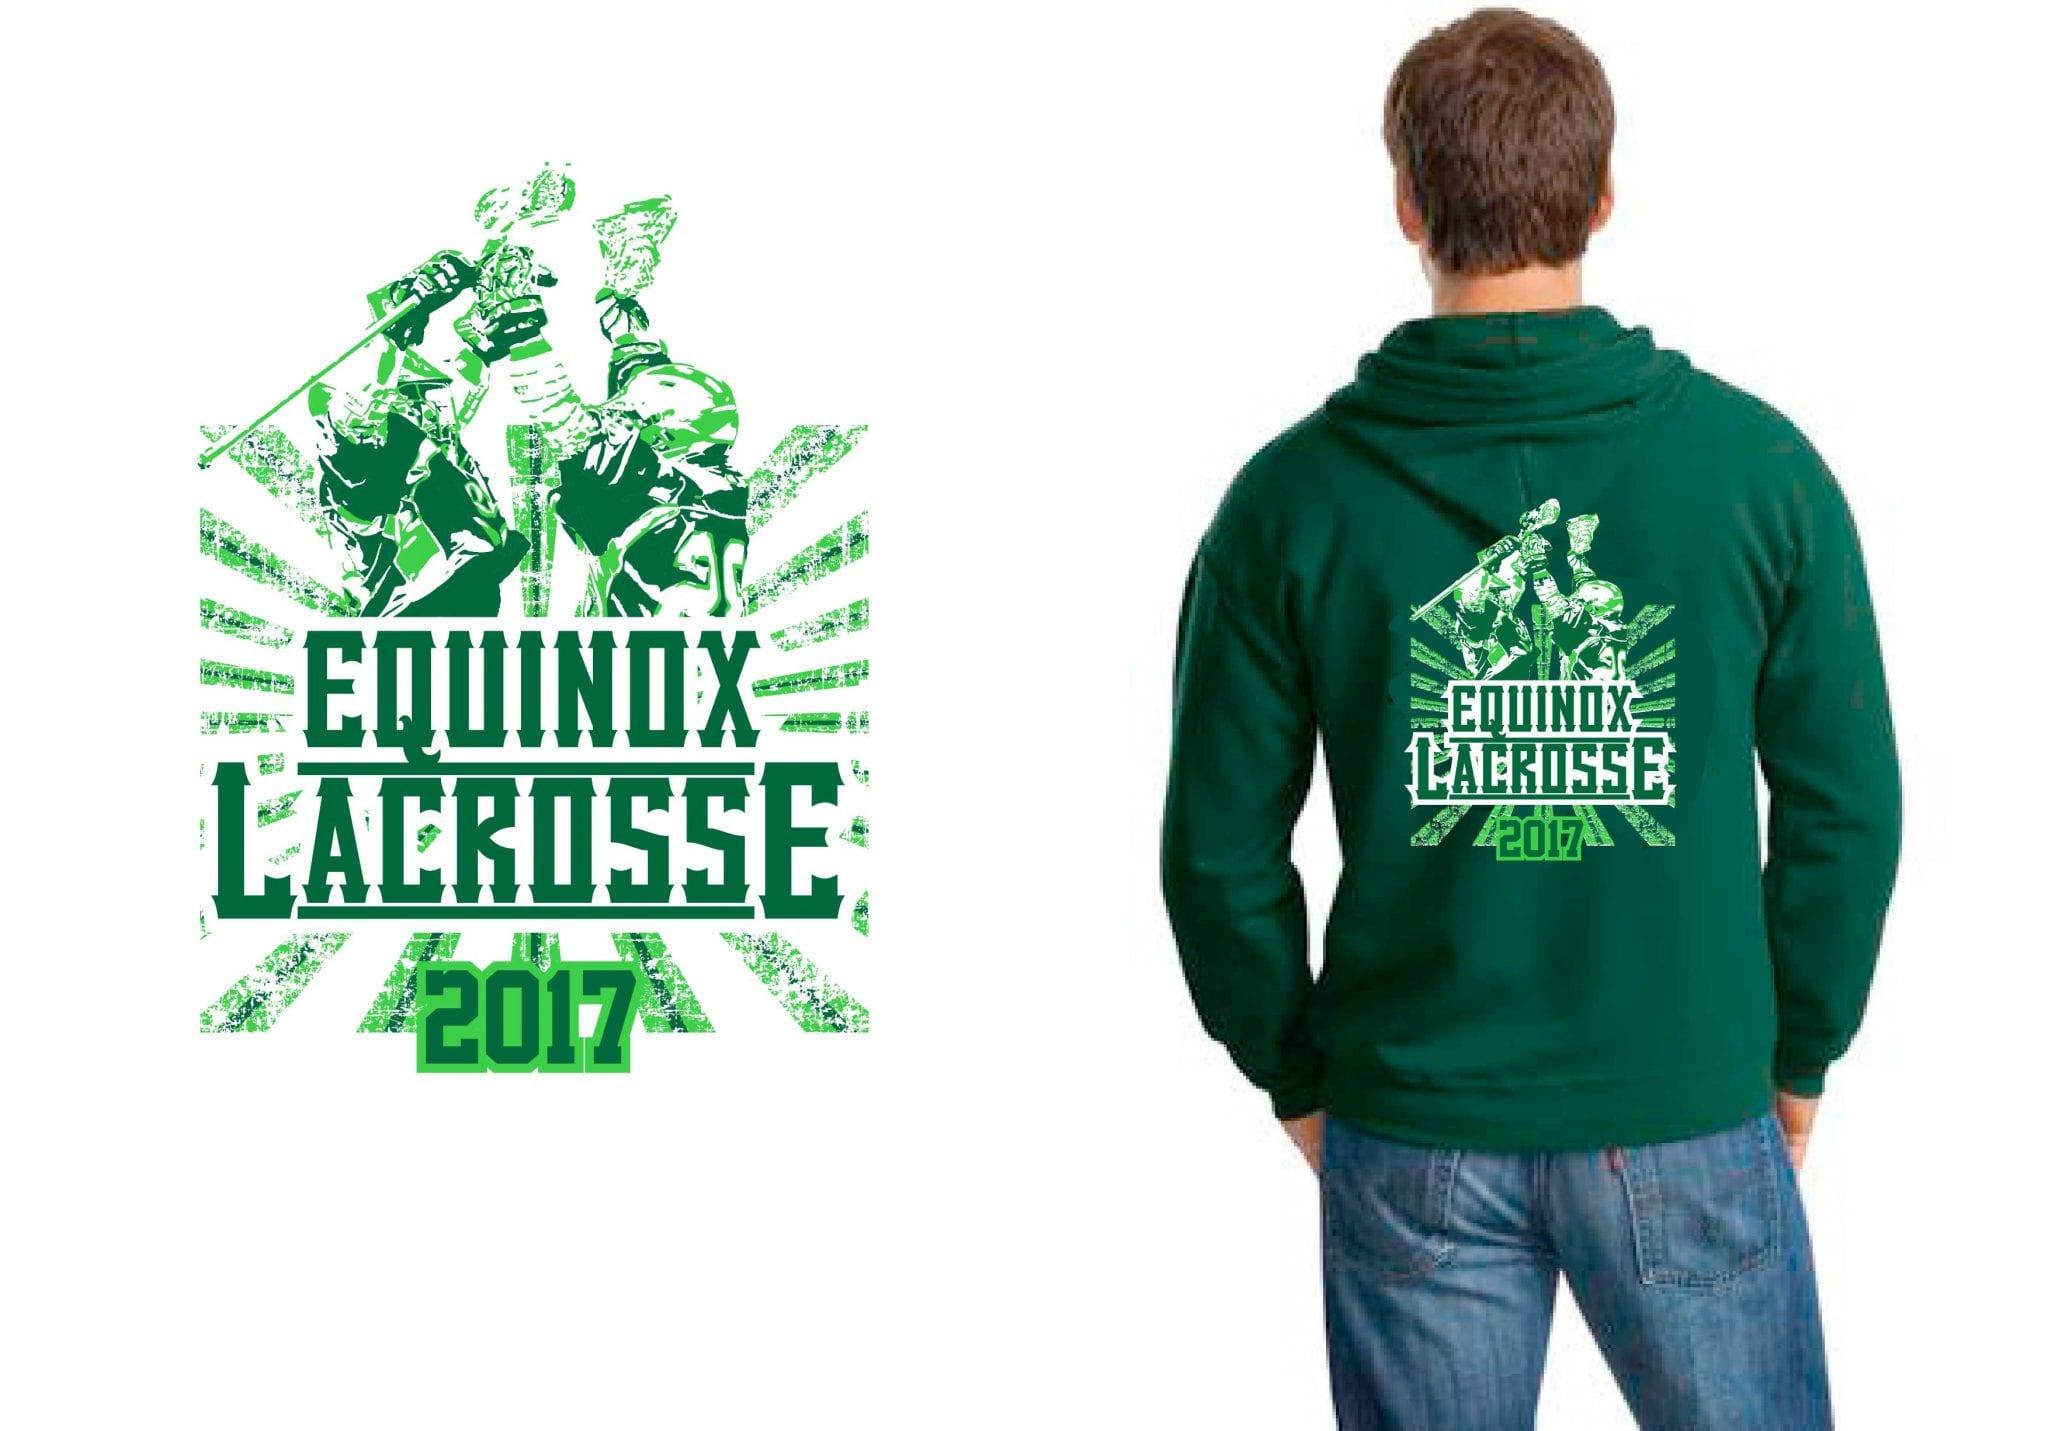 2017 Equinox Lacrosse vector logo design for t-shirt UrArtStudio